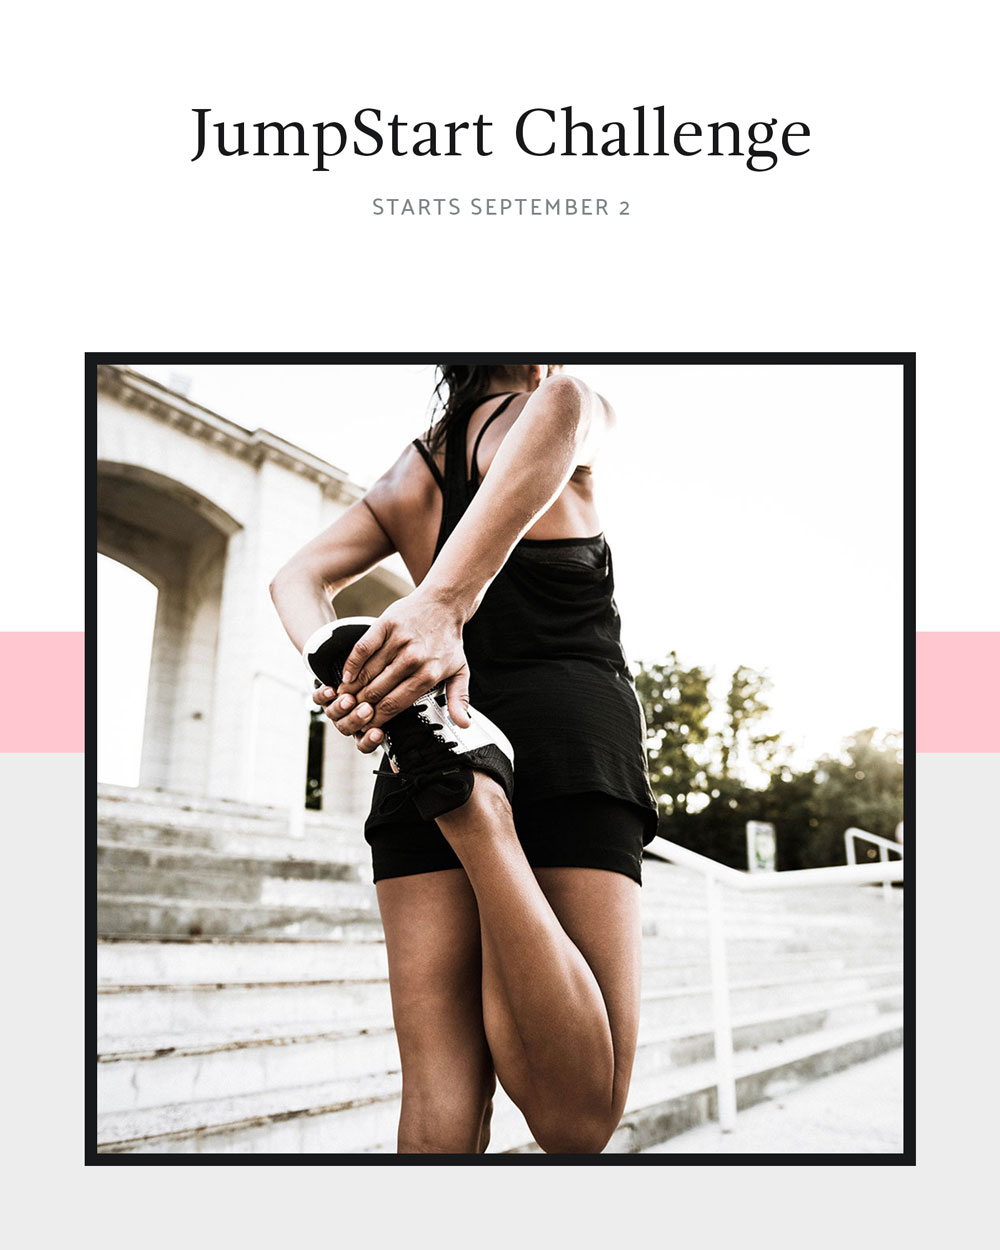 JumpStart Challenge